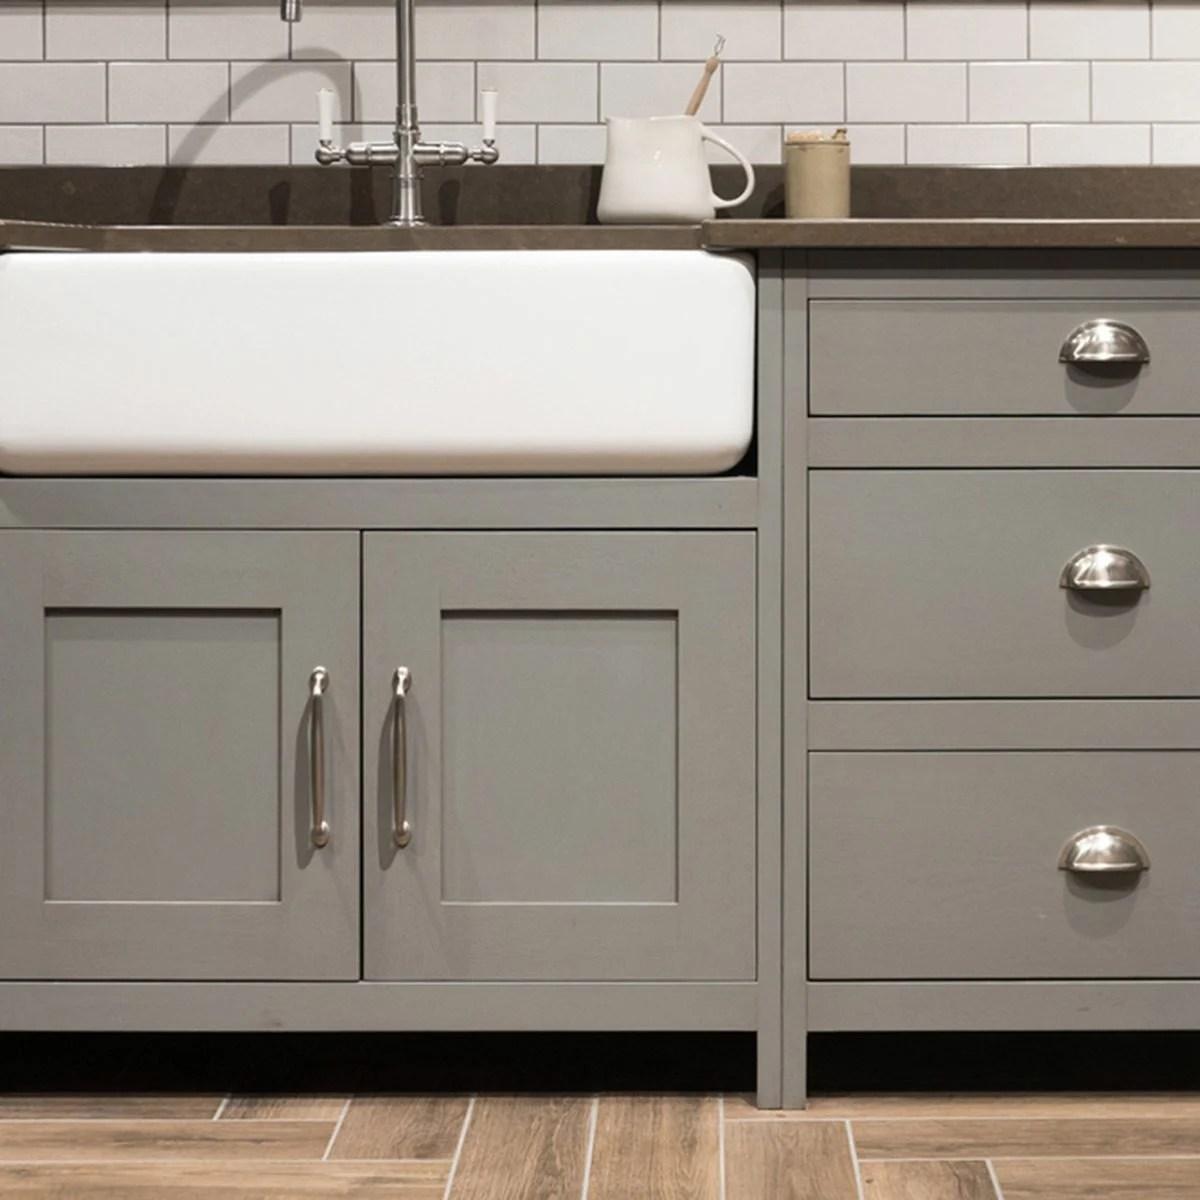 Pretty 2017 S Kitchen Cabinets Neutral Trending Kitchen Cabinet Colors Family Handyman S Kitchen Cabinets Denver kitchen Pictures Of Kitchen Cabinets